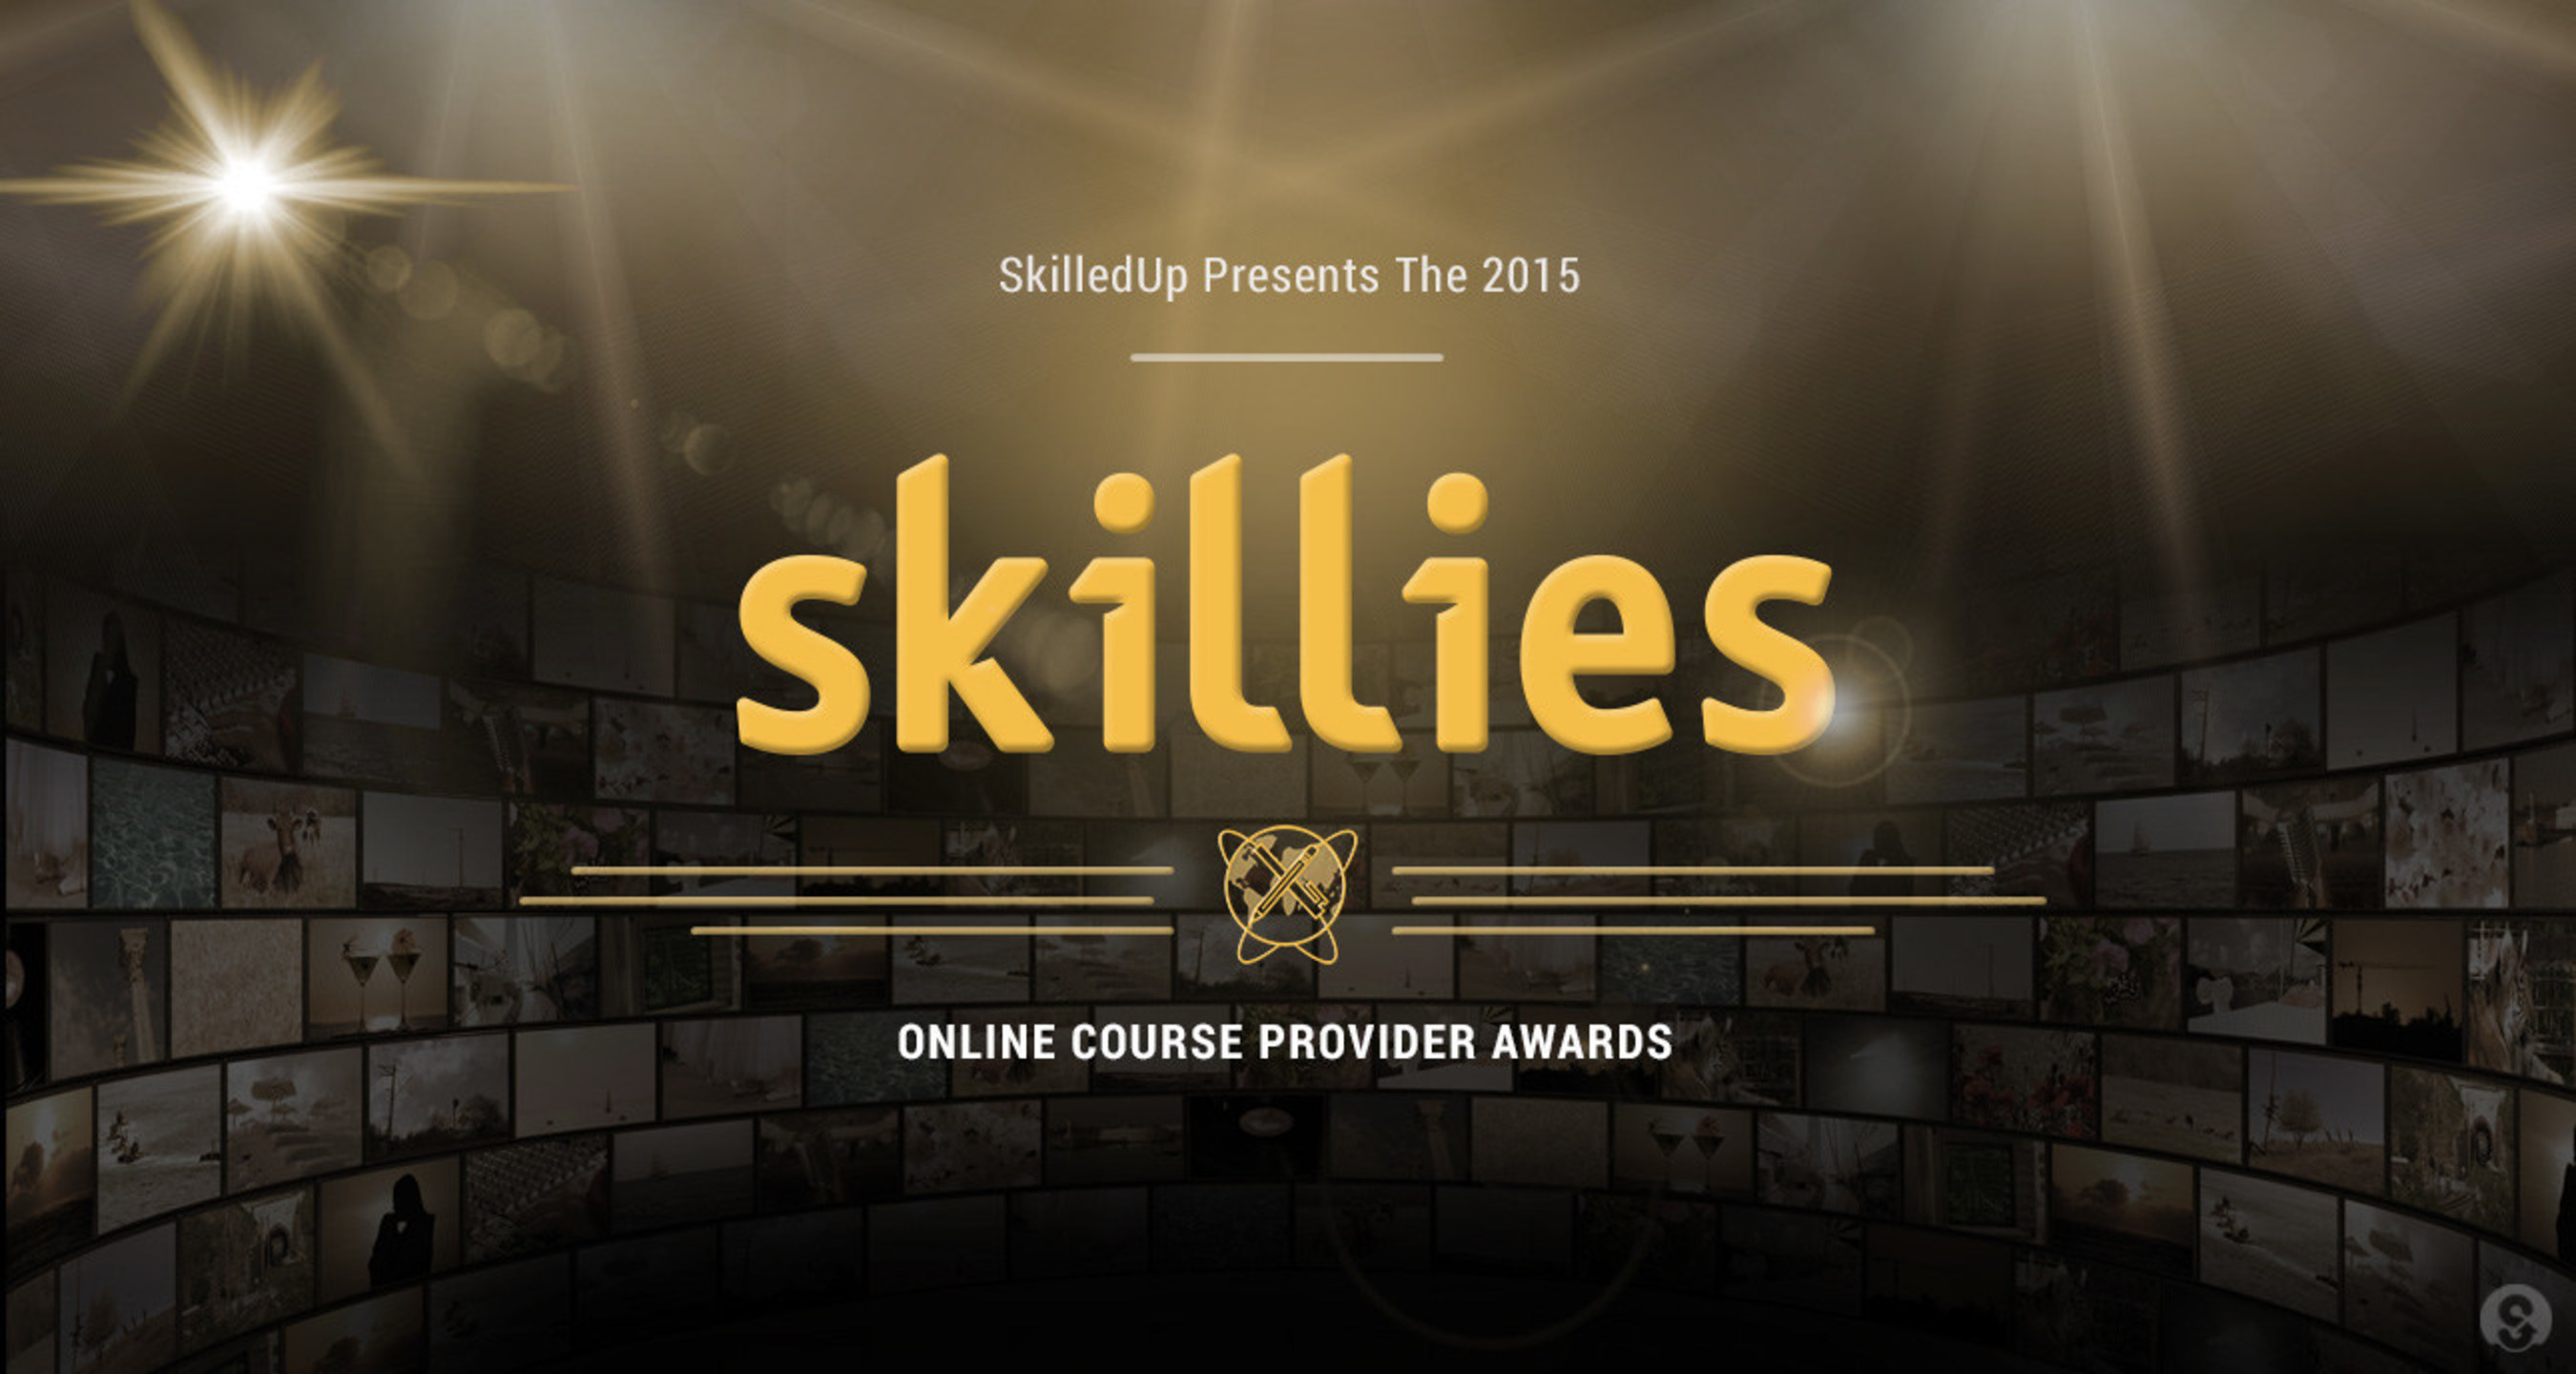 SkilledUp Presents the 2015 Skillies